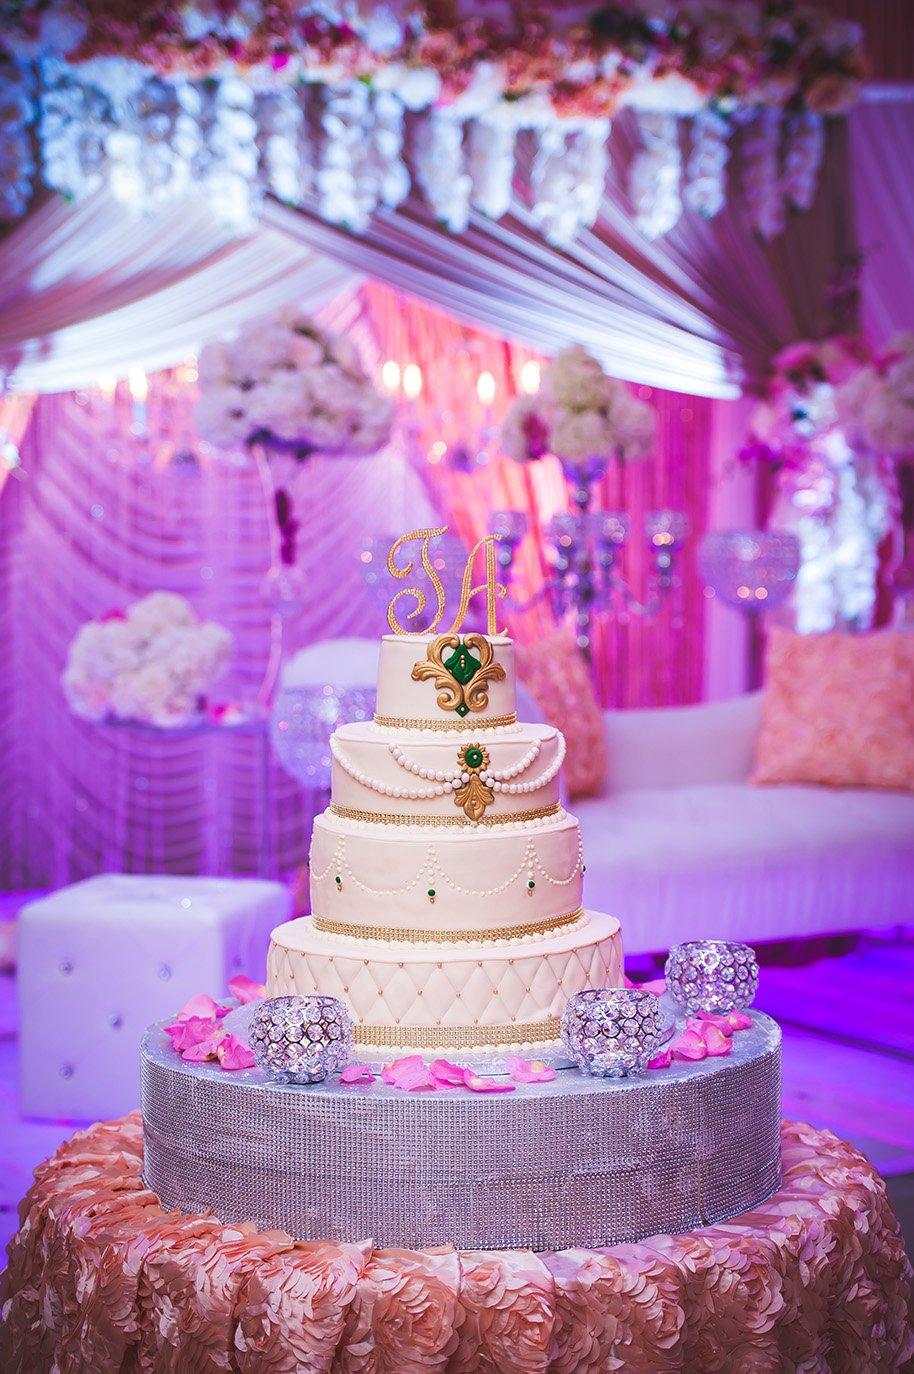 Da-Mikele-Illagio-Wedding-Cake-Photo Details